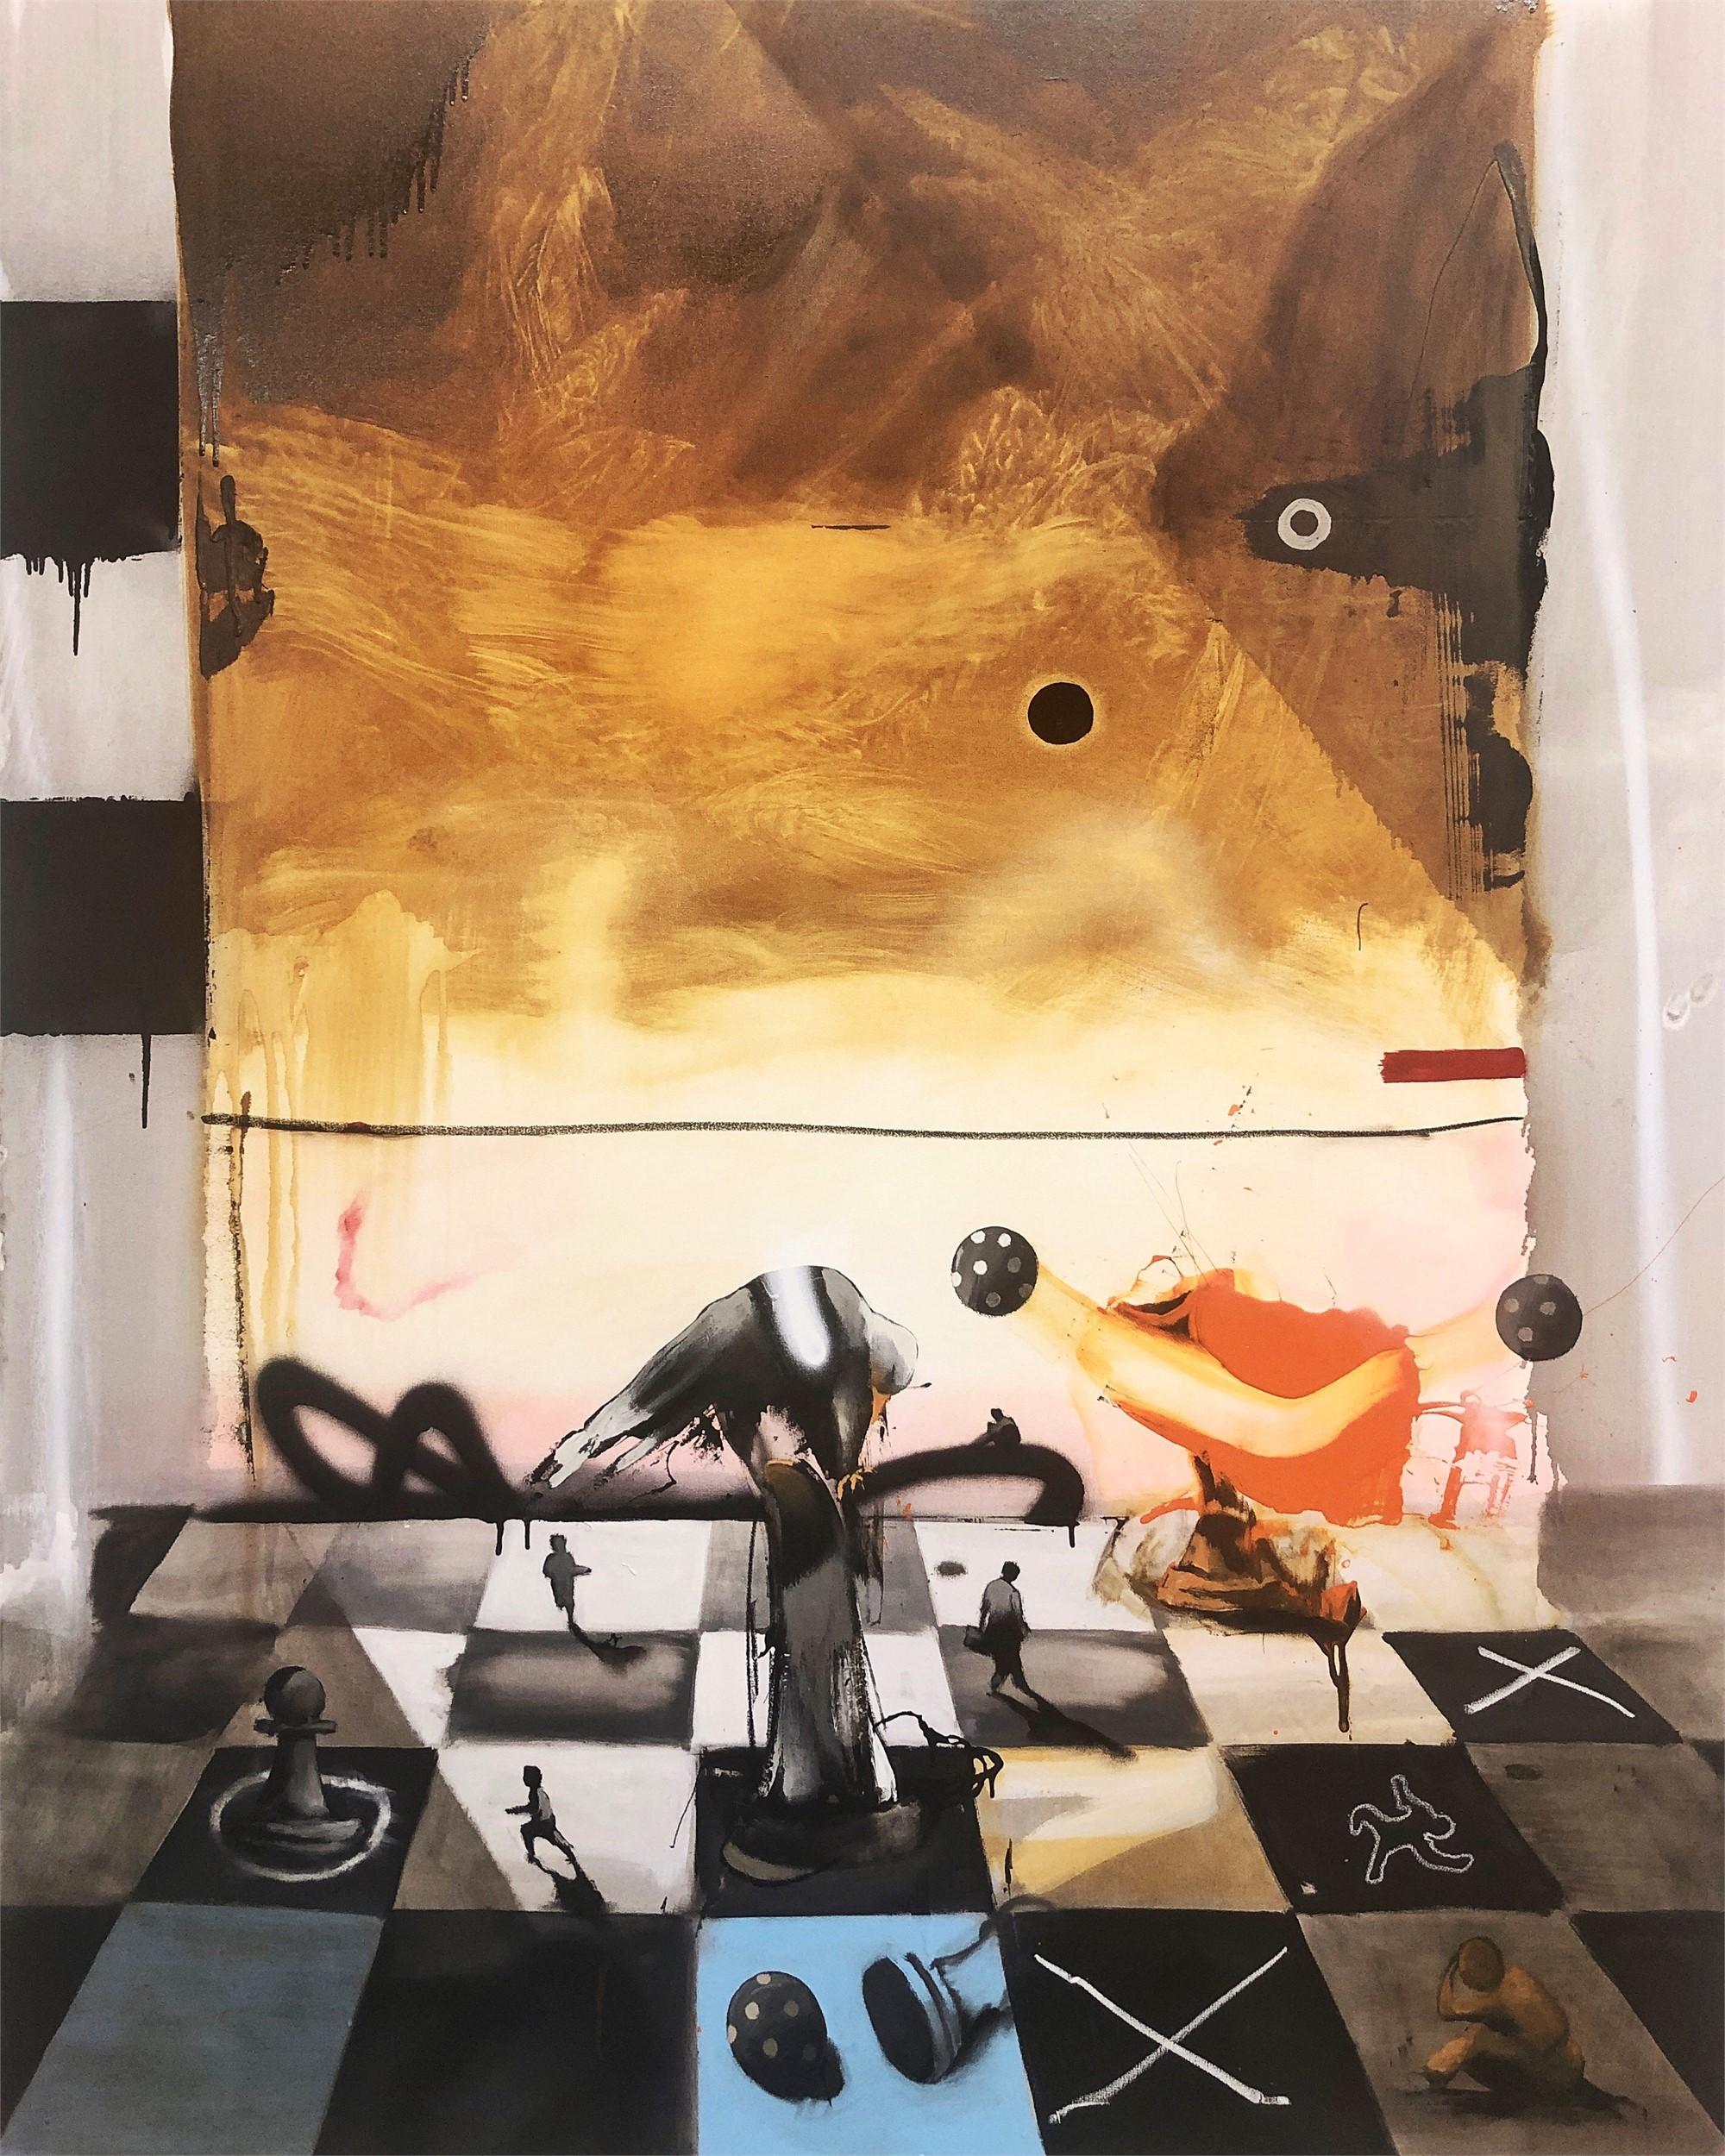 Grand Chessboard by Marcus Jansen